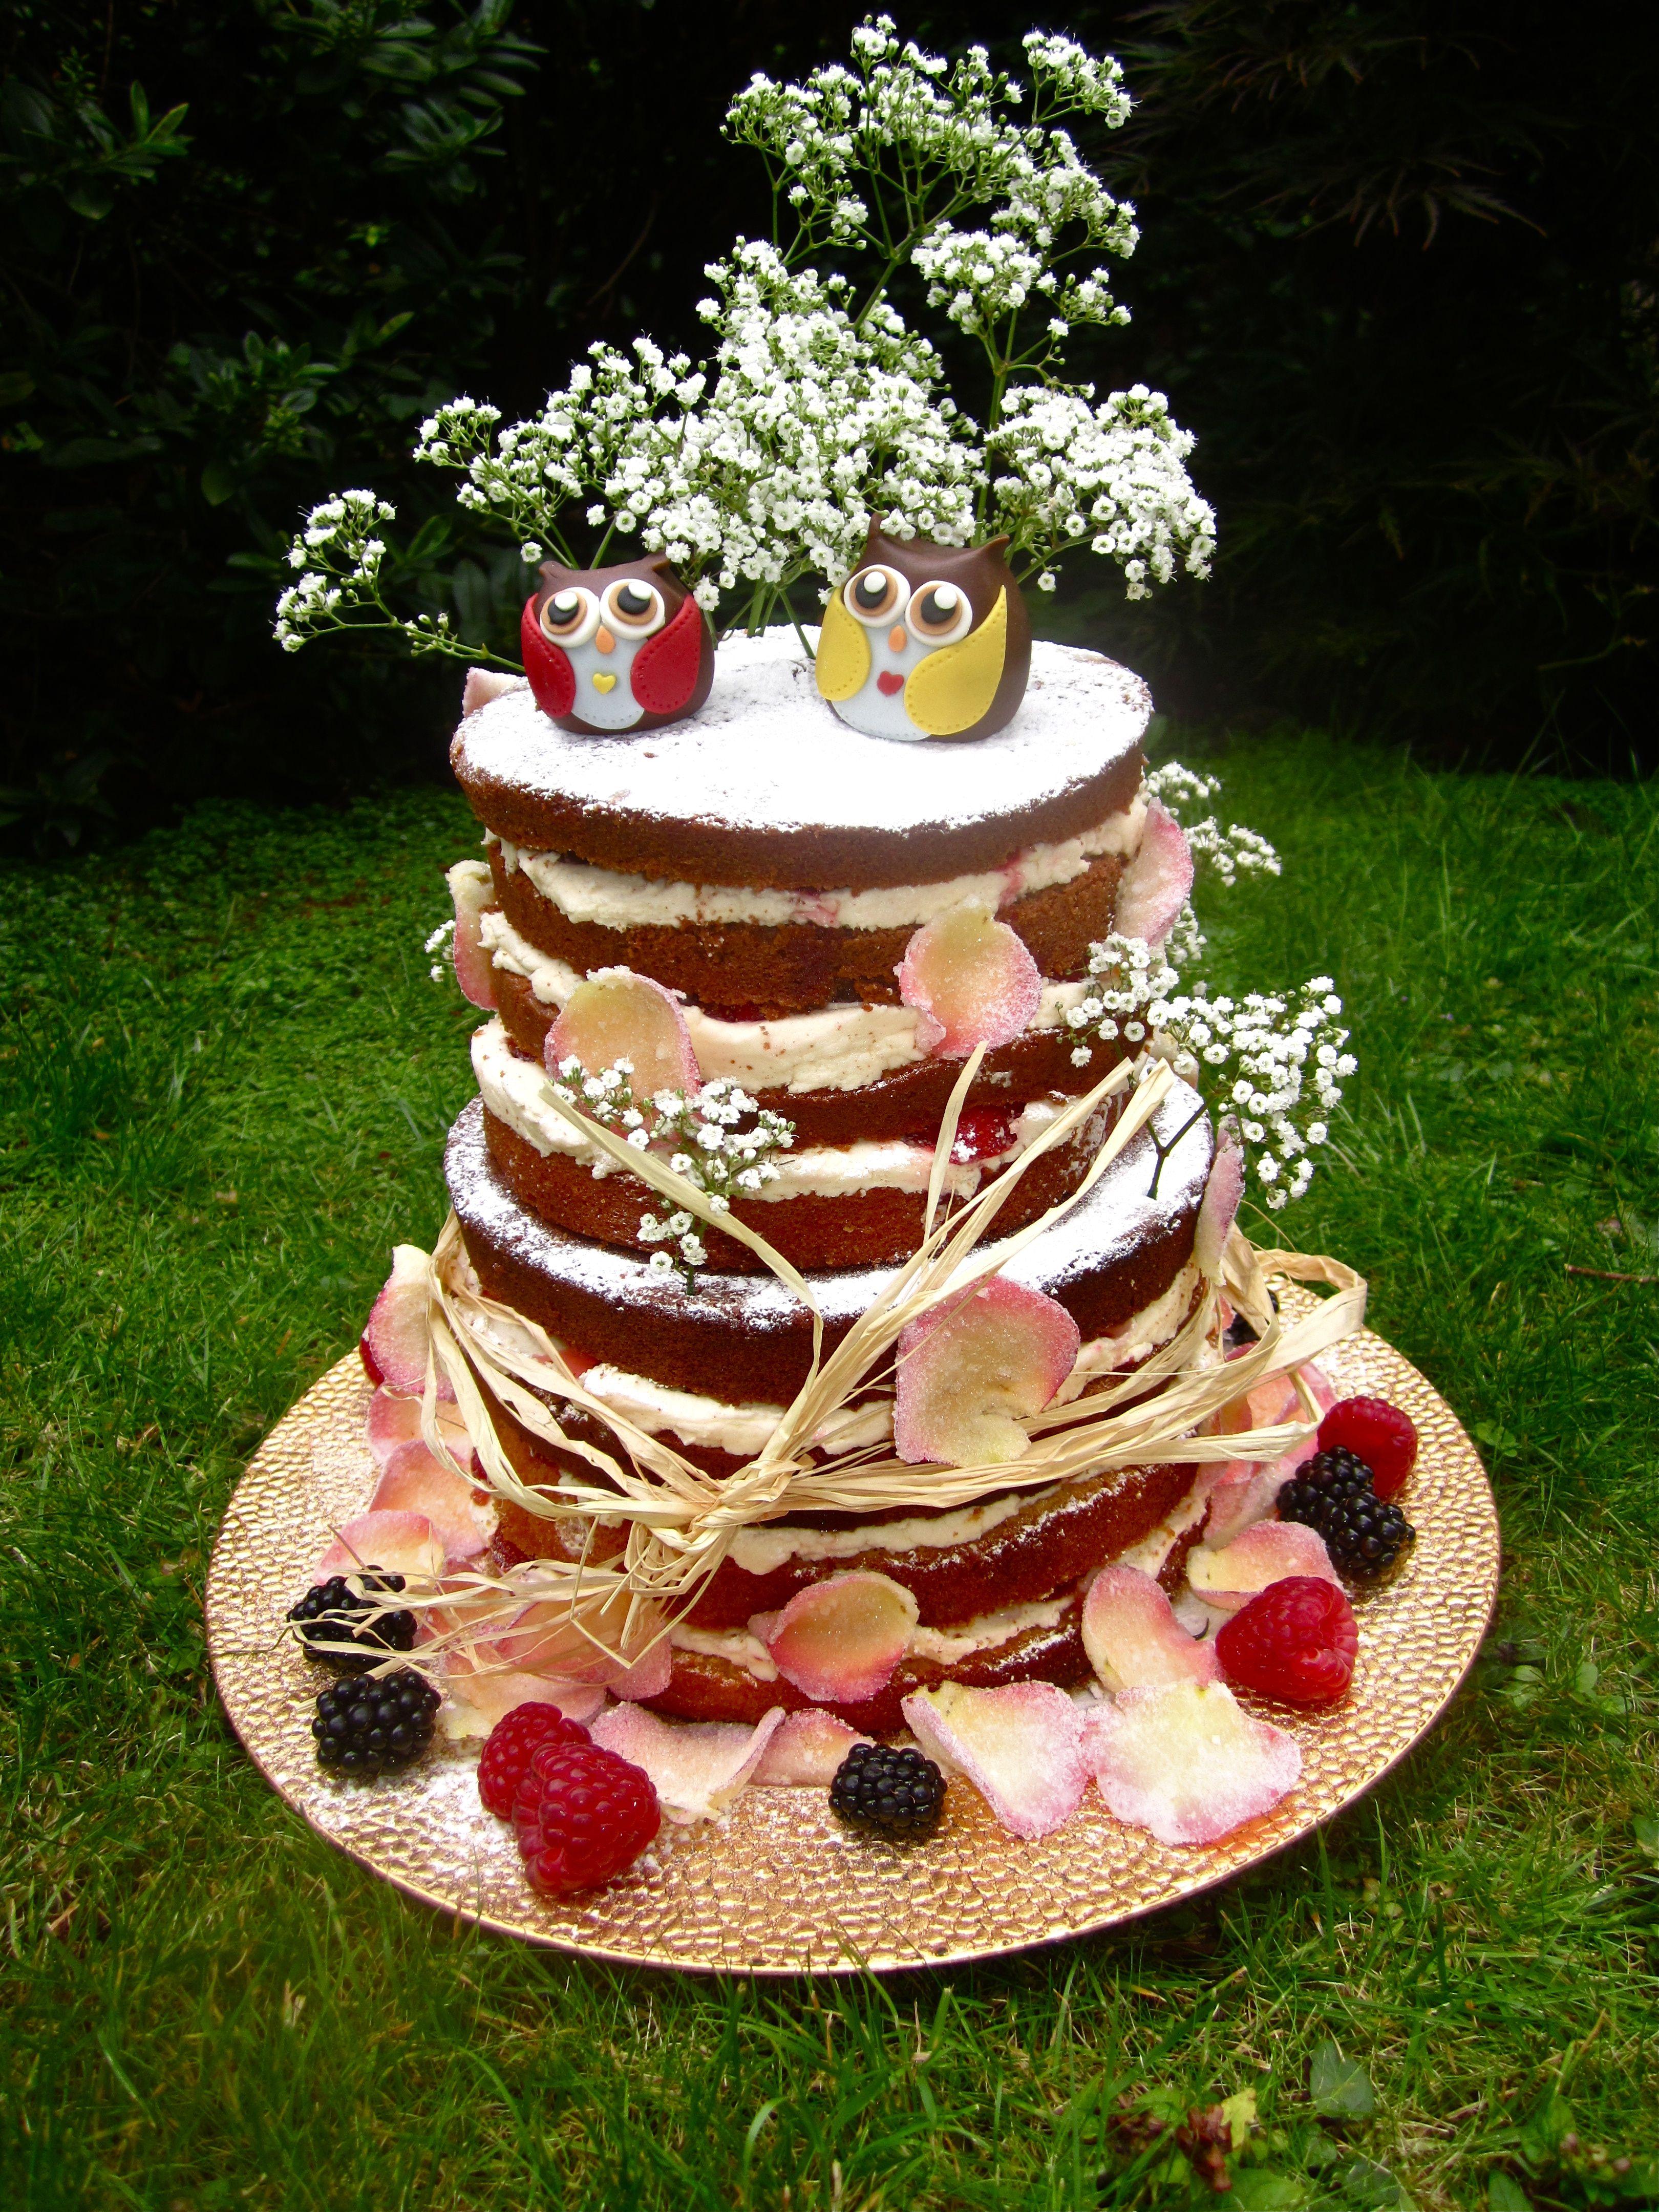 Naked Wedding Cake 8 Layers Of Victoria Sponge With Vanilla Buttercream Strawberry Jam